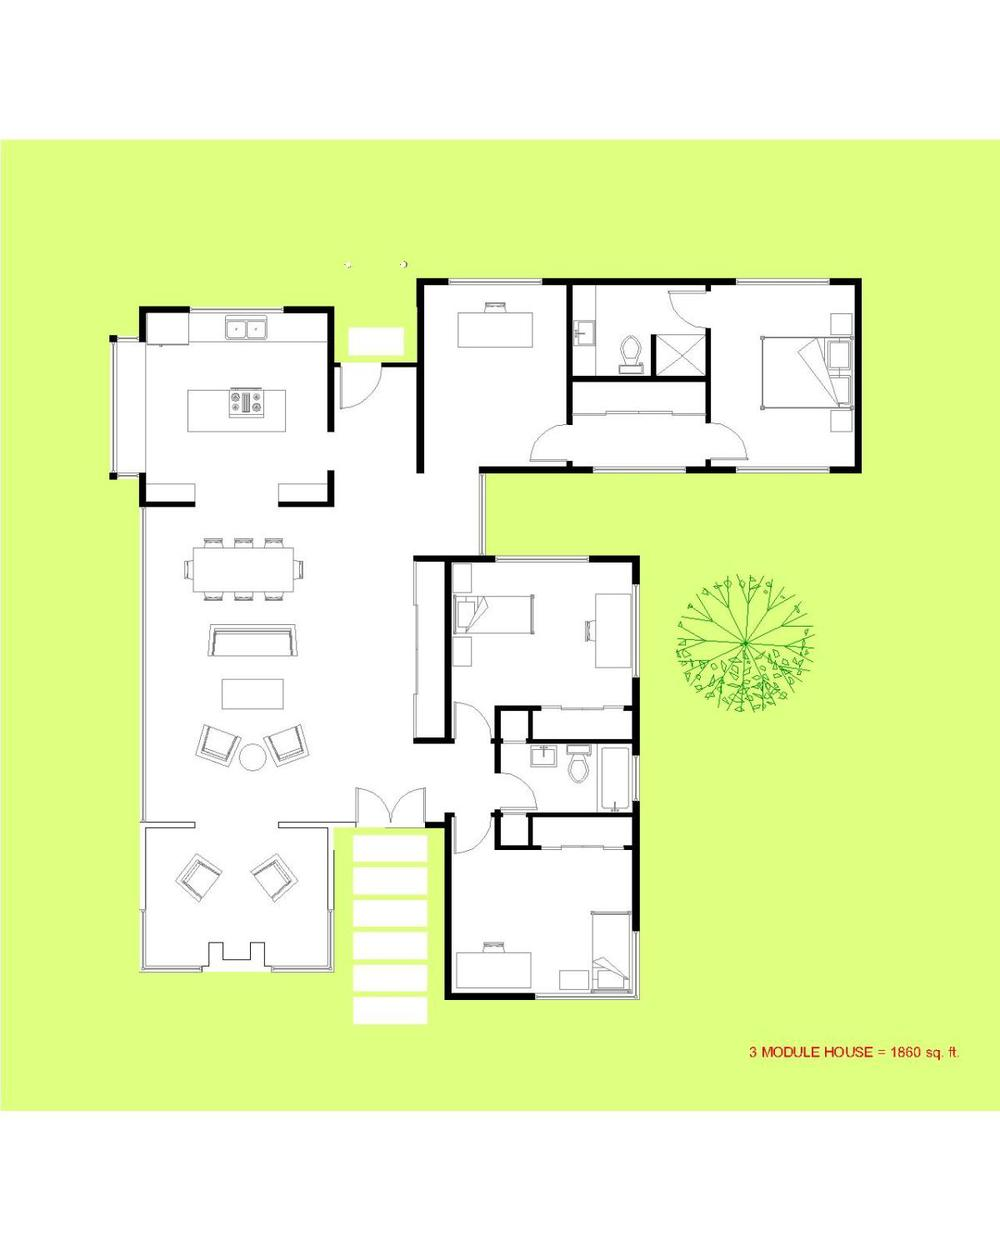 Trillium Architects 3 bar modern modular floor Plan